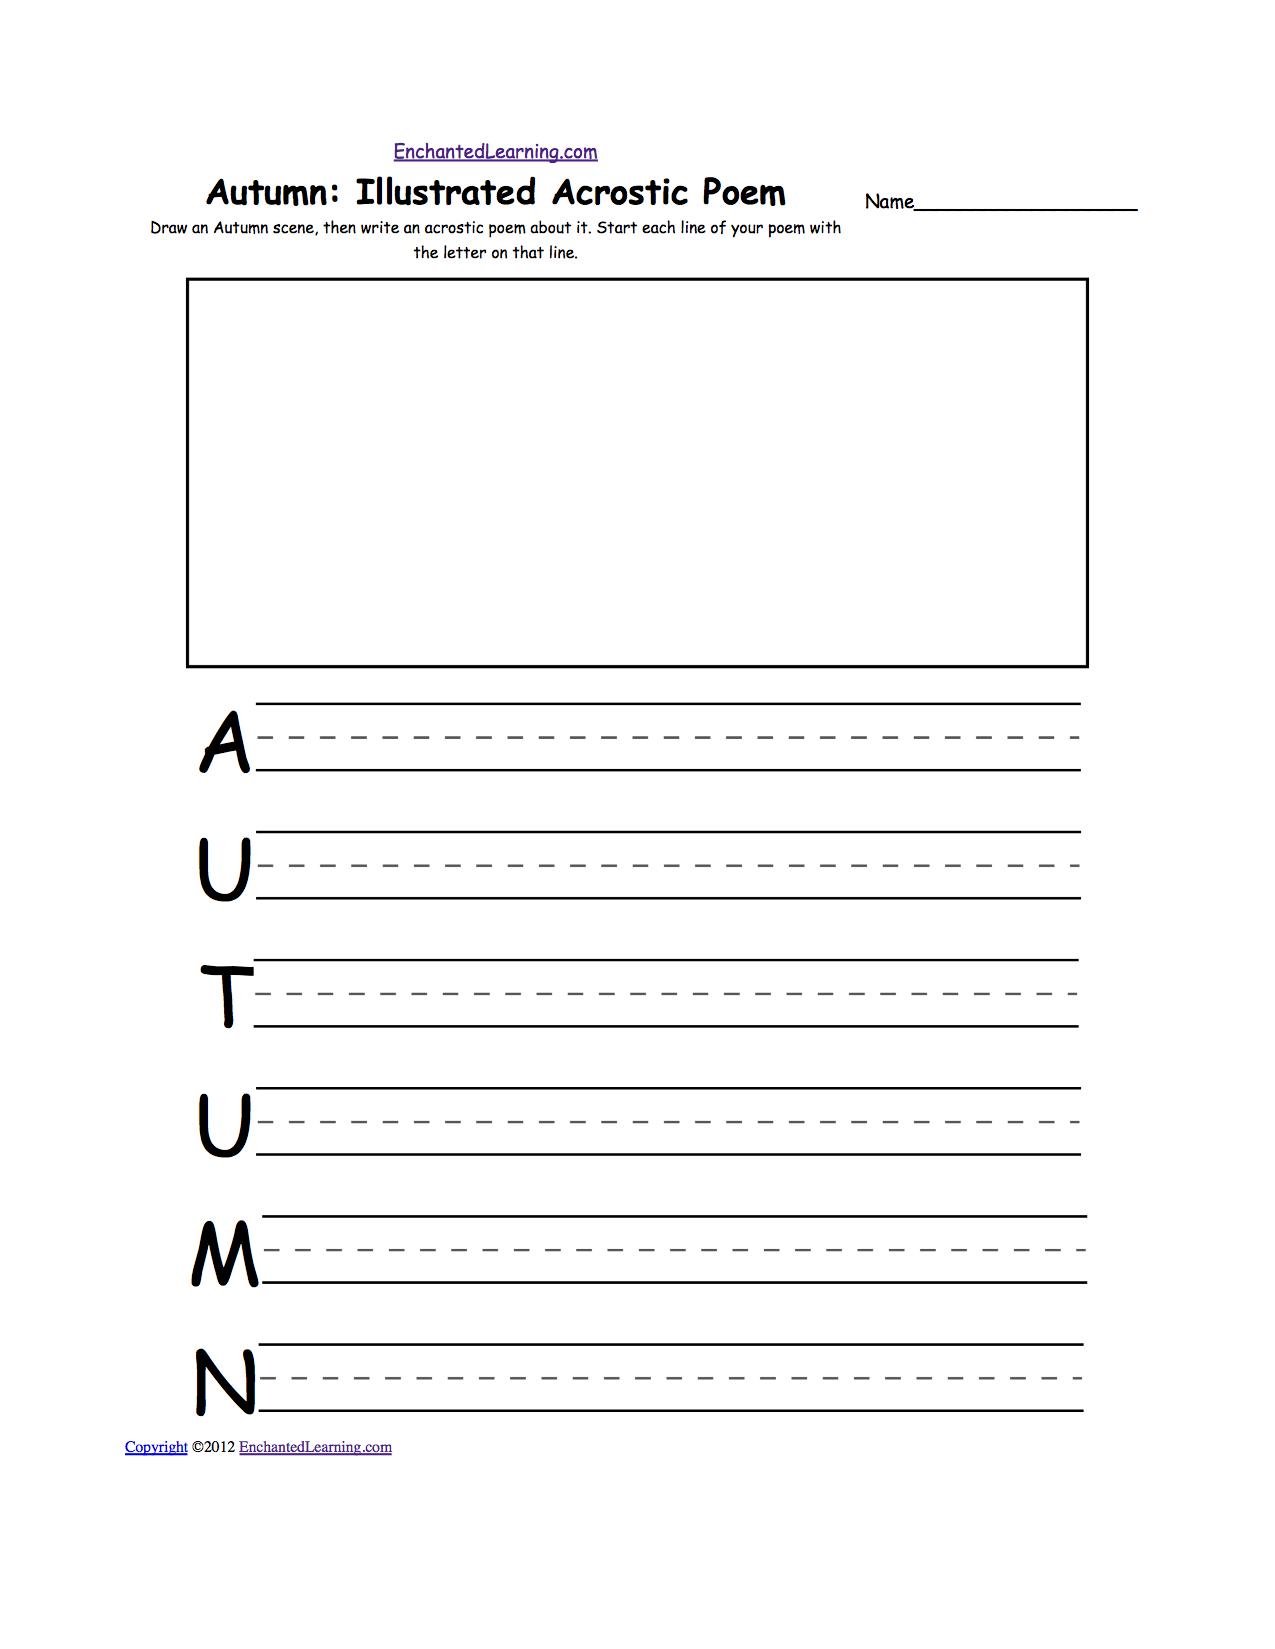 q&a a day 5 year journal pdf free